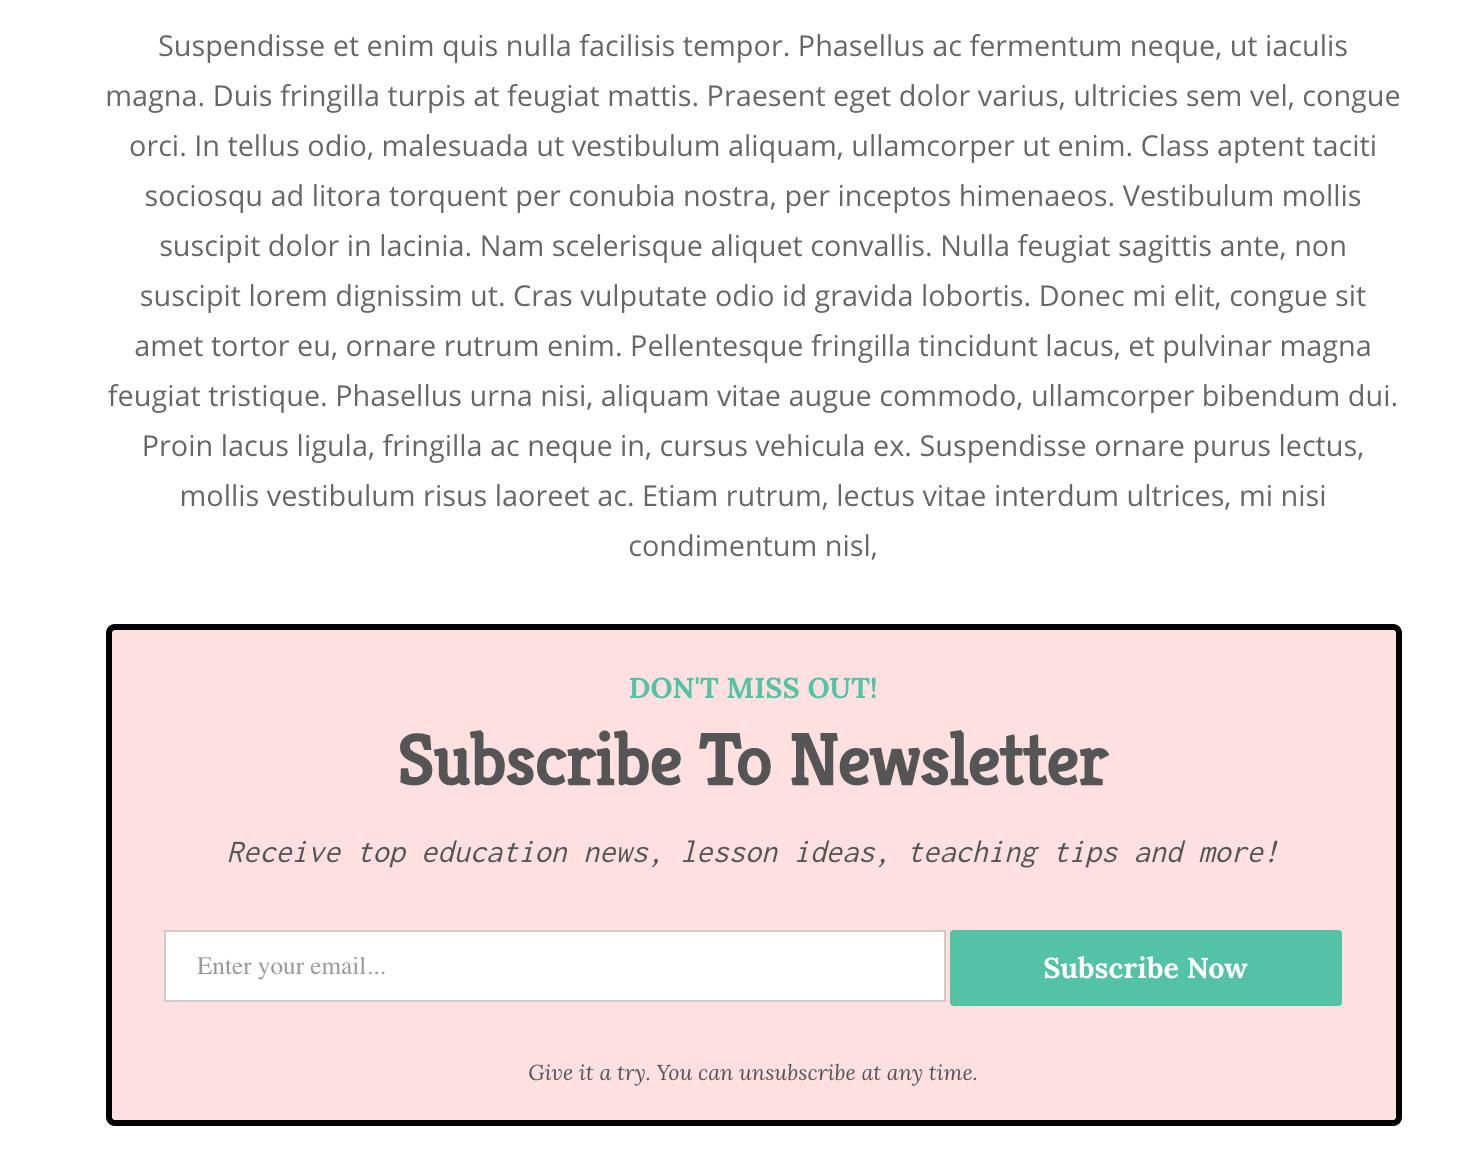 Tablet optimized email newsletter